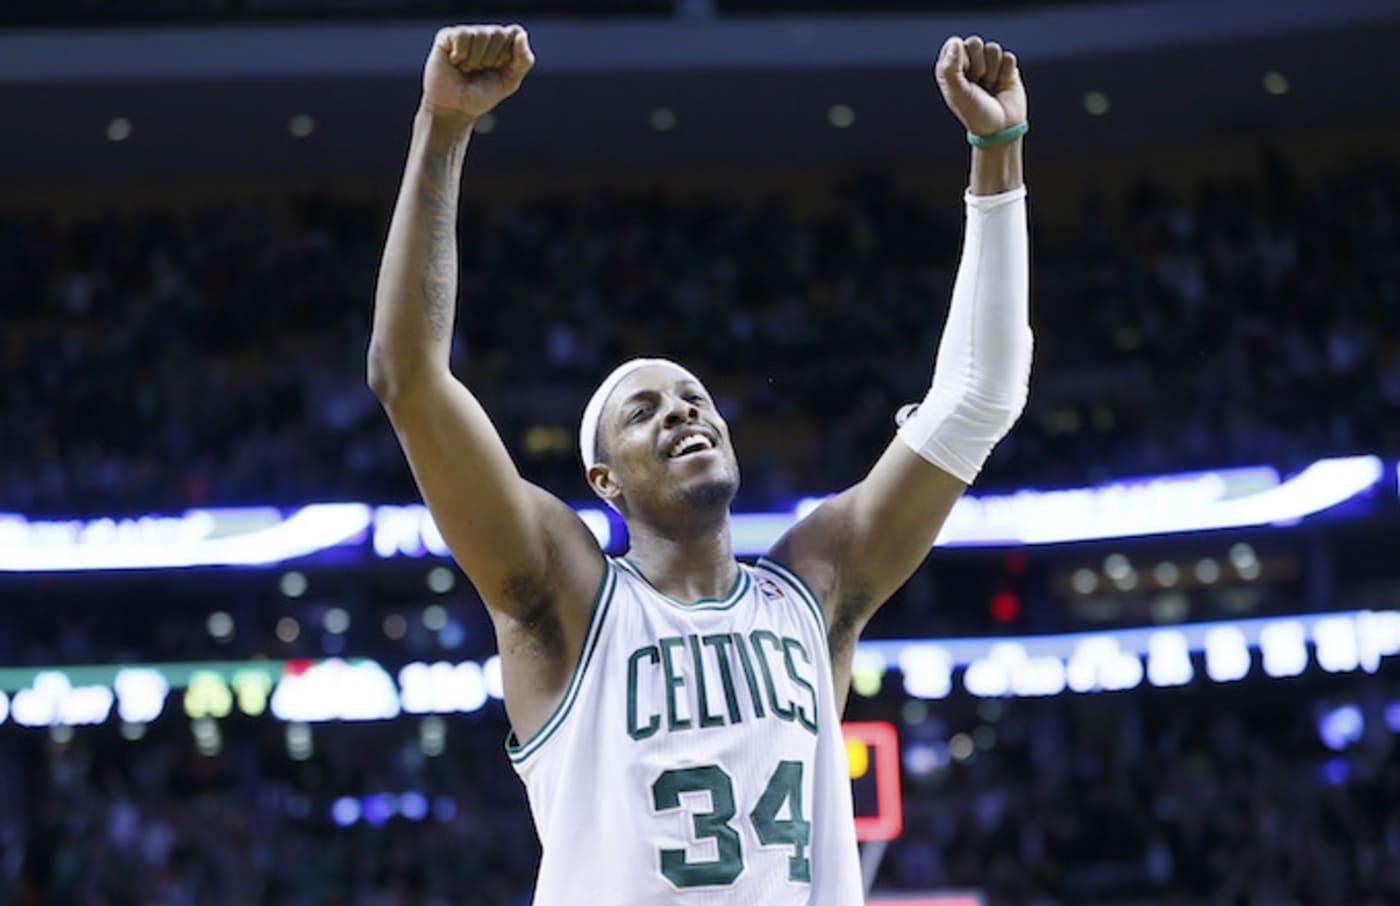 Paul Pierce celebrates win after Celtics 118 114 3OT victory over the Denver Nuggets.